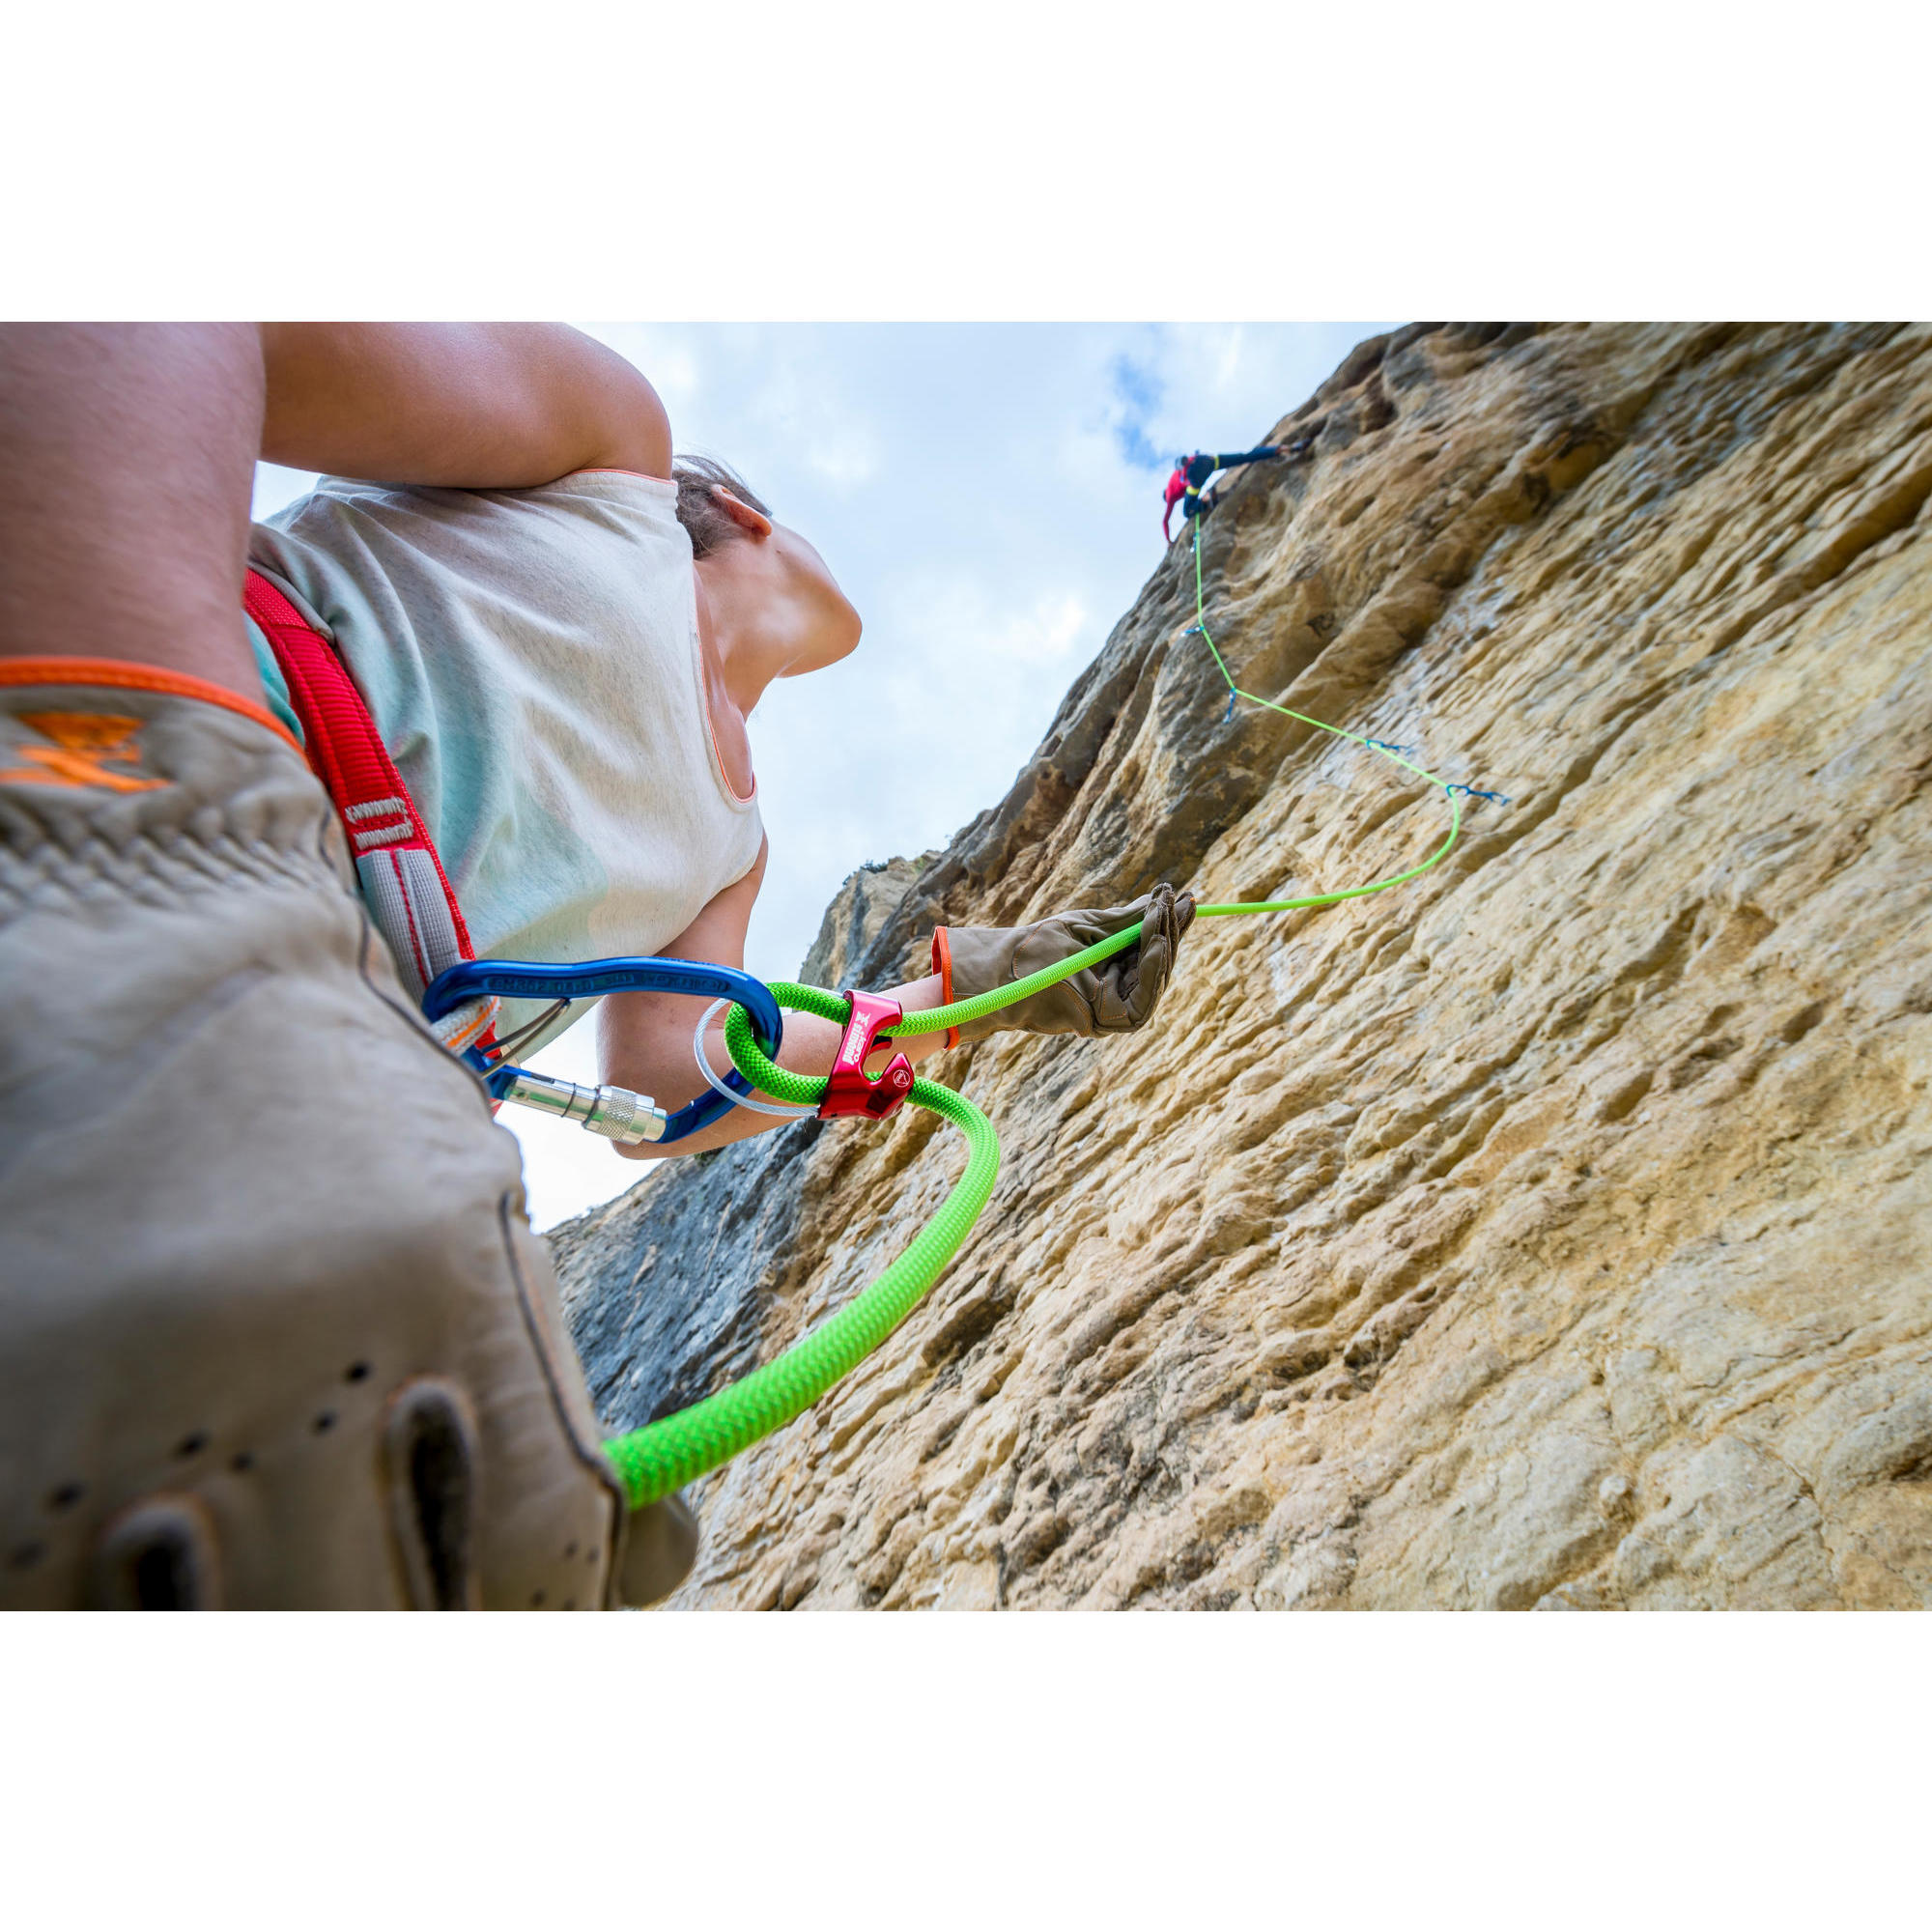 Decathlon Klettergurt Jay : Kletterseil cliff mm m grün simond decathlon